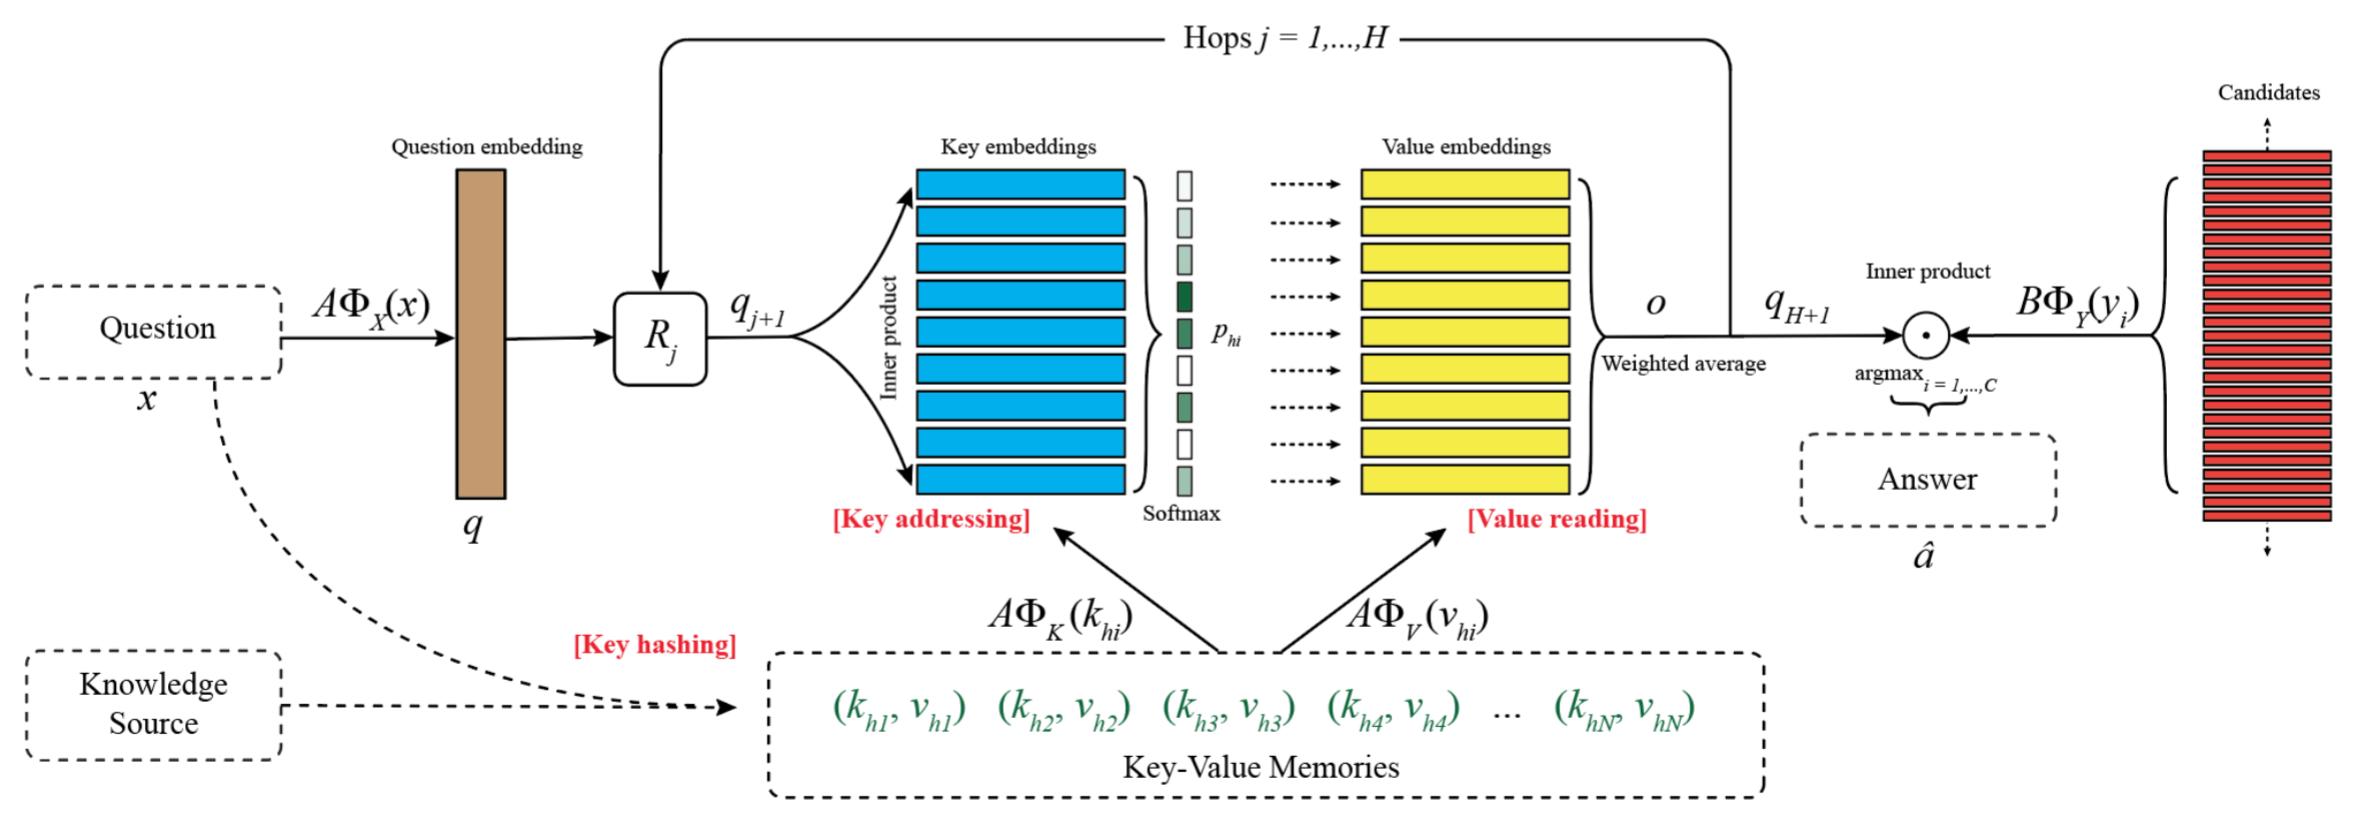 Key Value Memory Networks